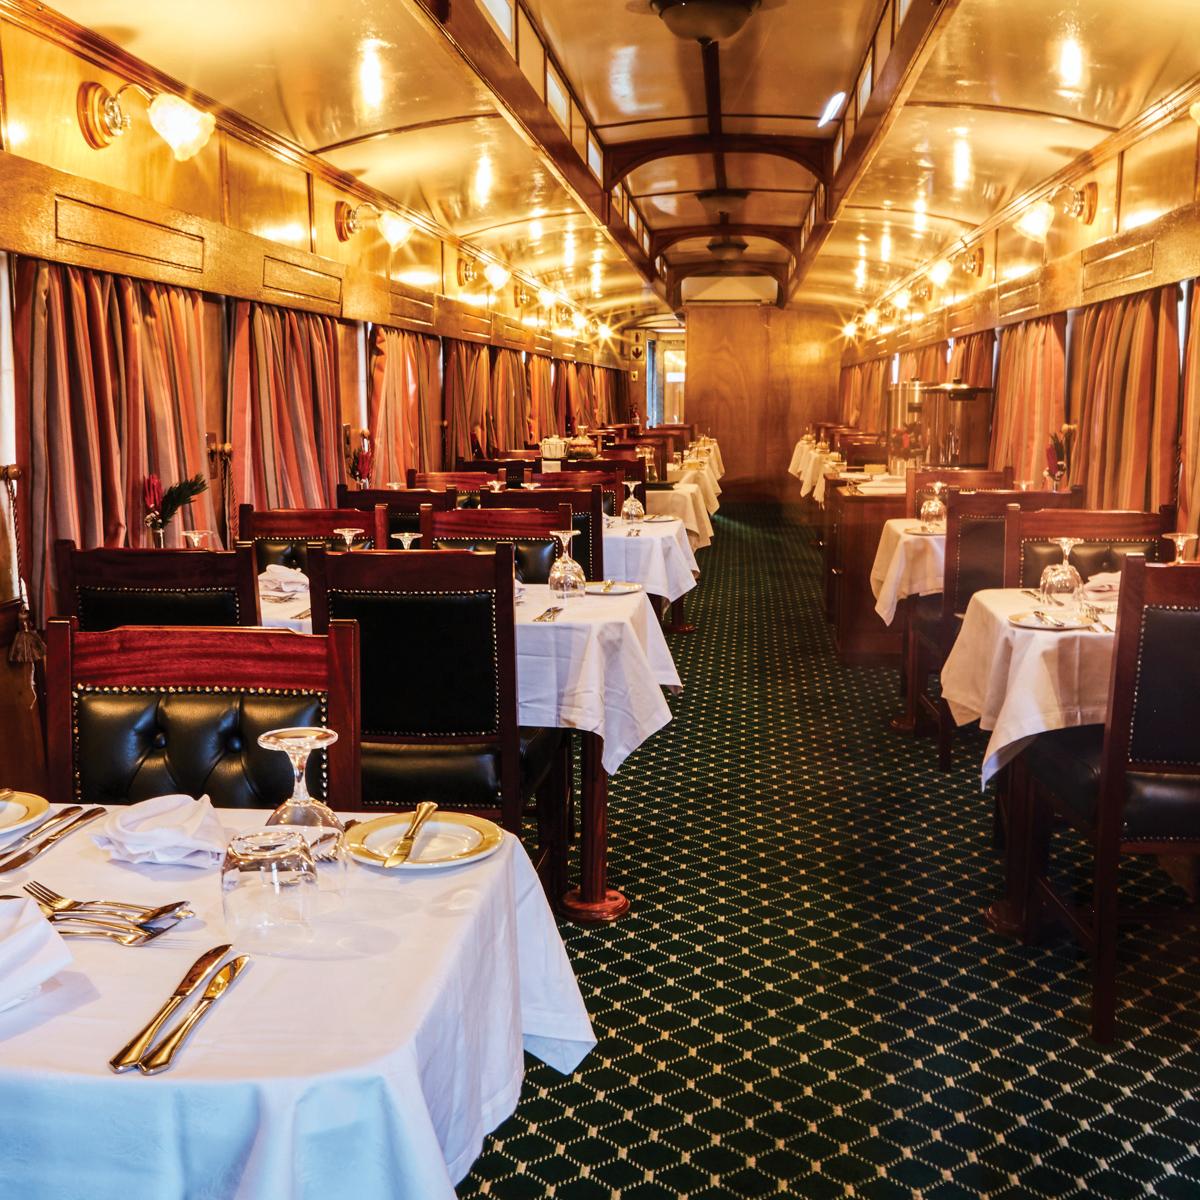 Rovos Rail Shongololo Zug Kreuzfahrt durch Südafrika-8